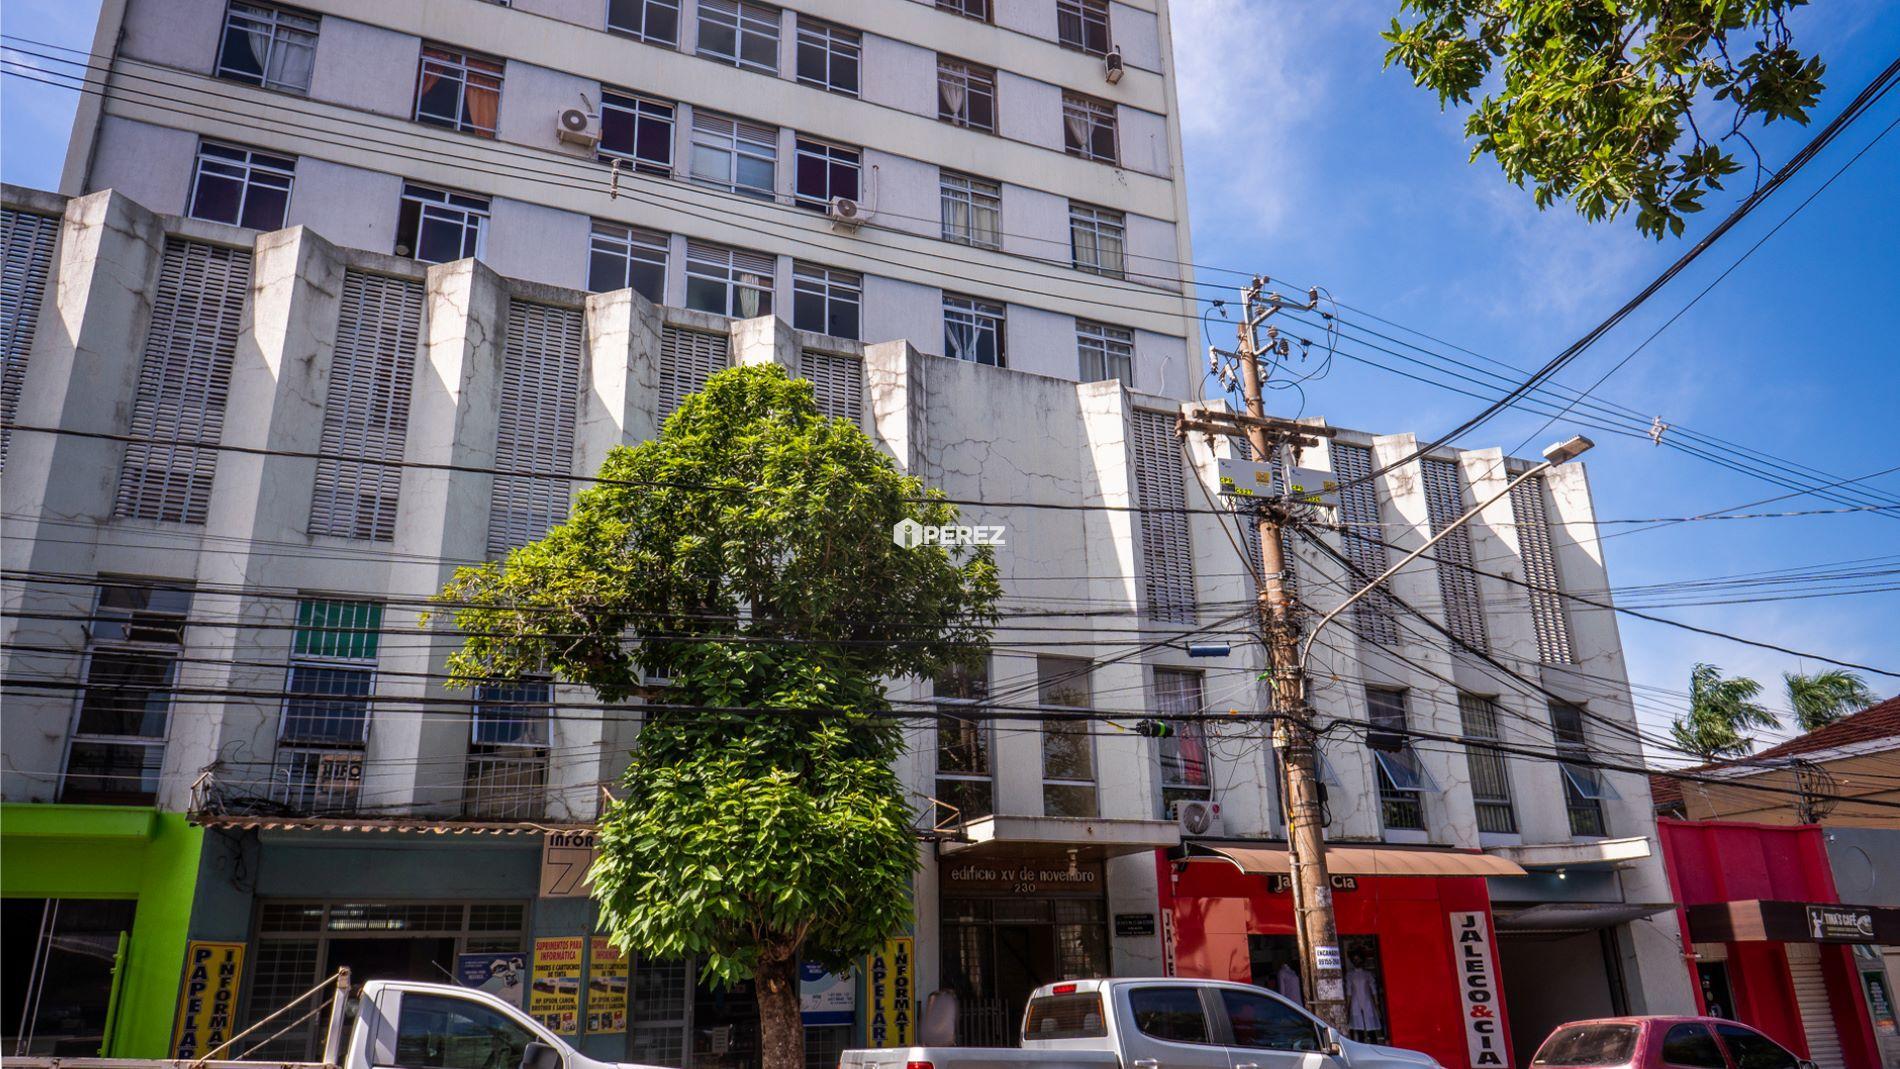 aluguel-campo-grande-ms-apartamento-quinze-de-novembro-centro-perez-imoveis